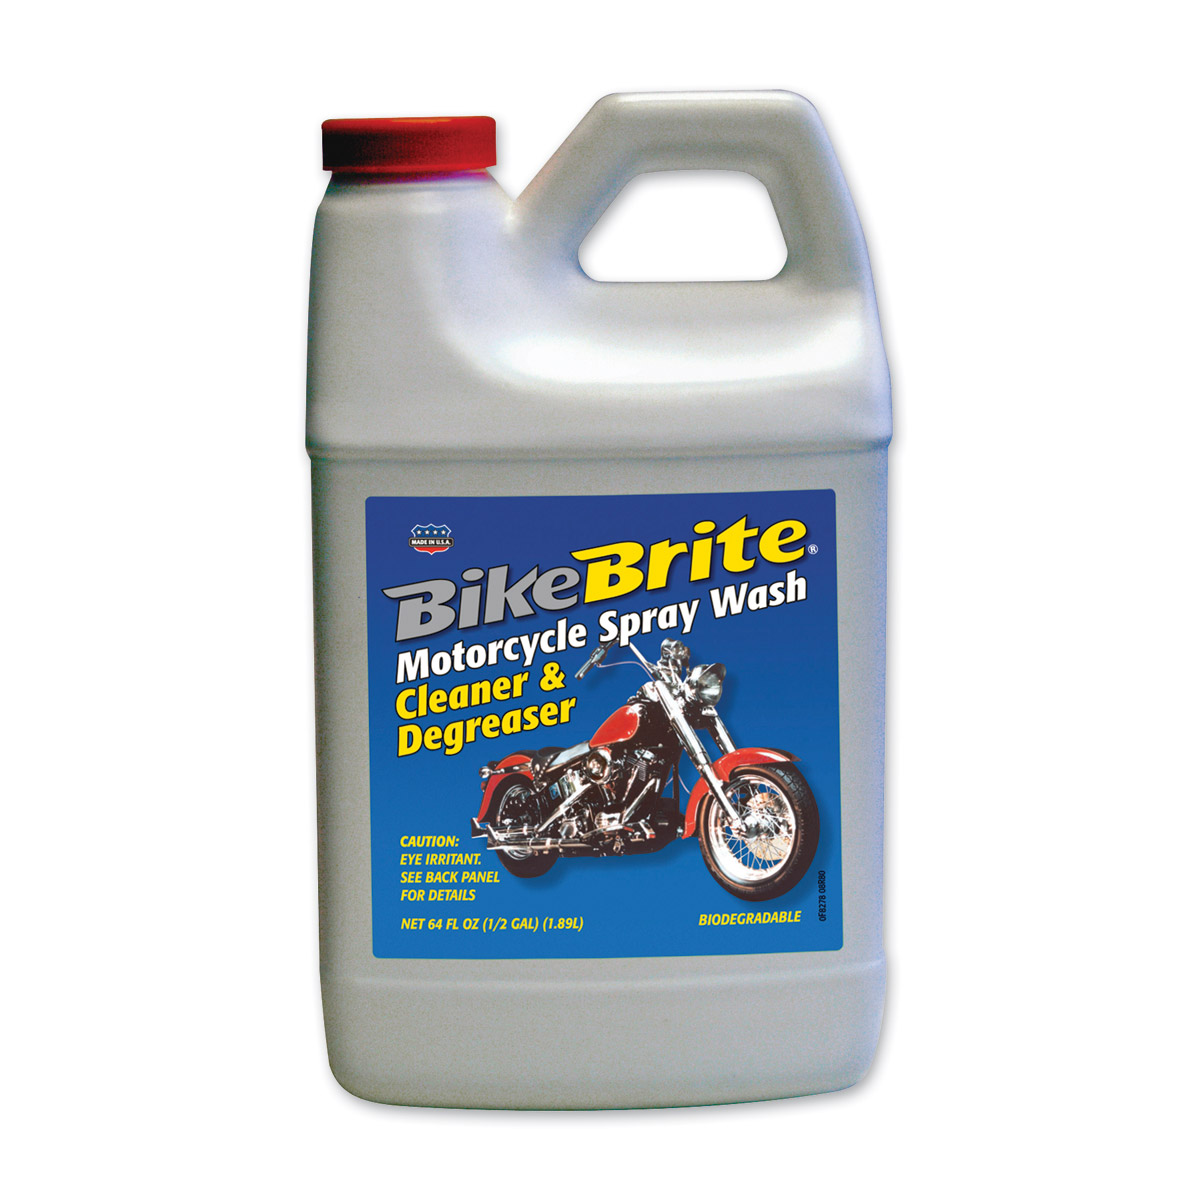 Bike Brite Cleaner & Degreaser